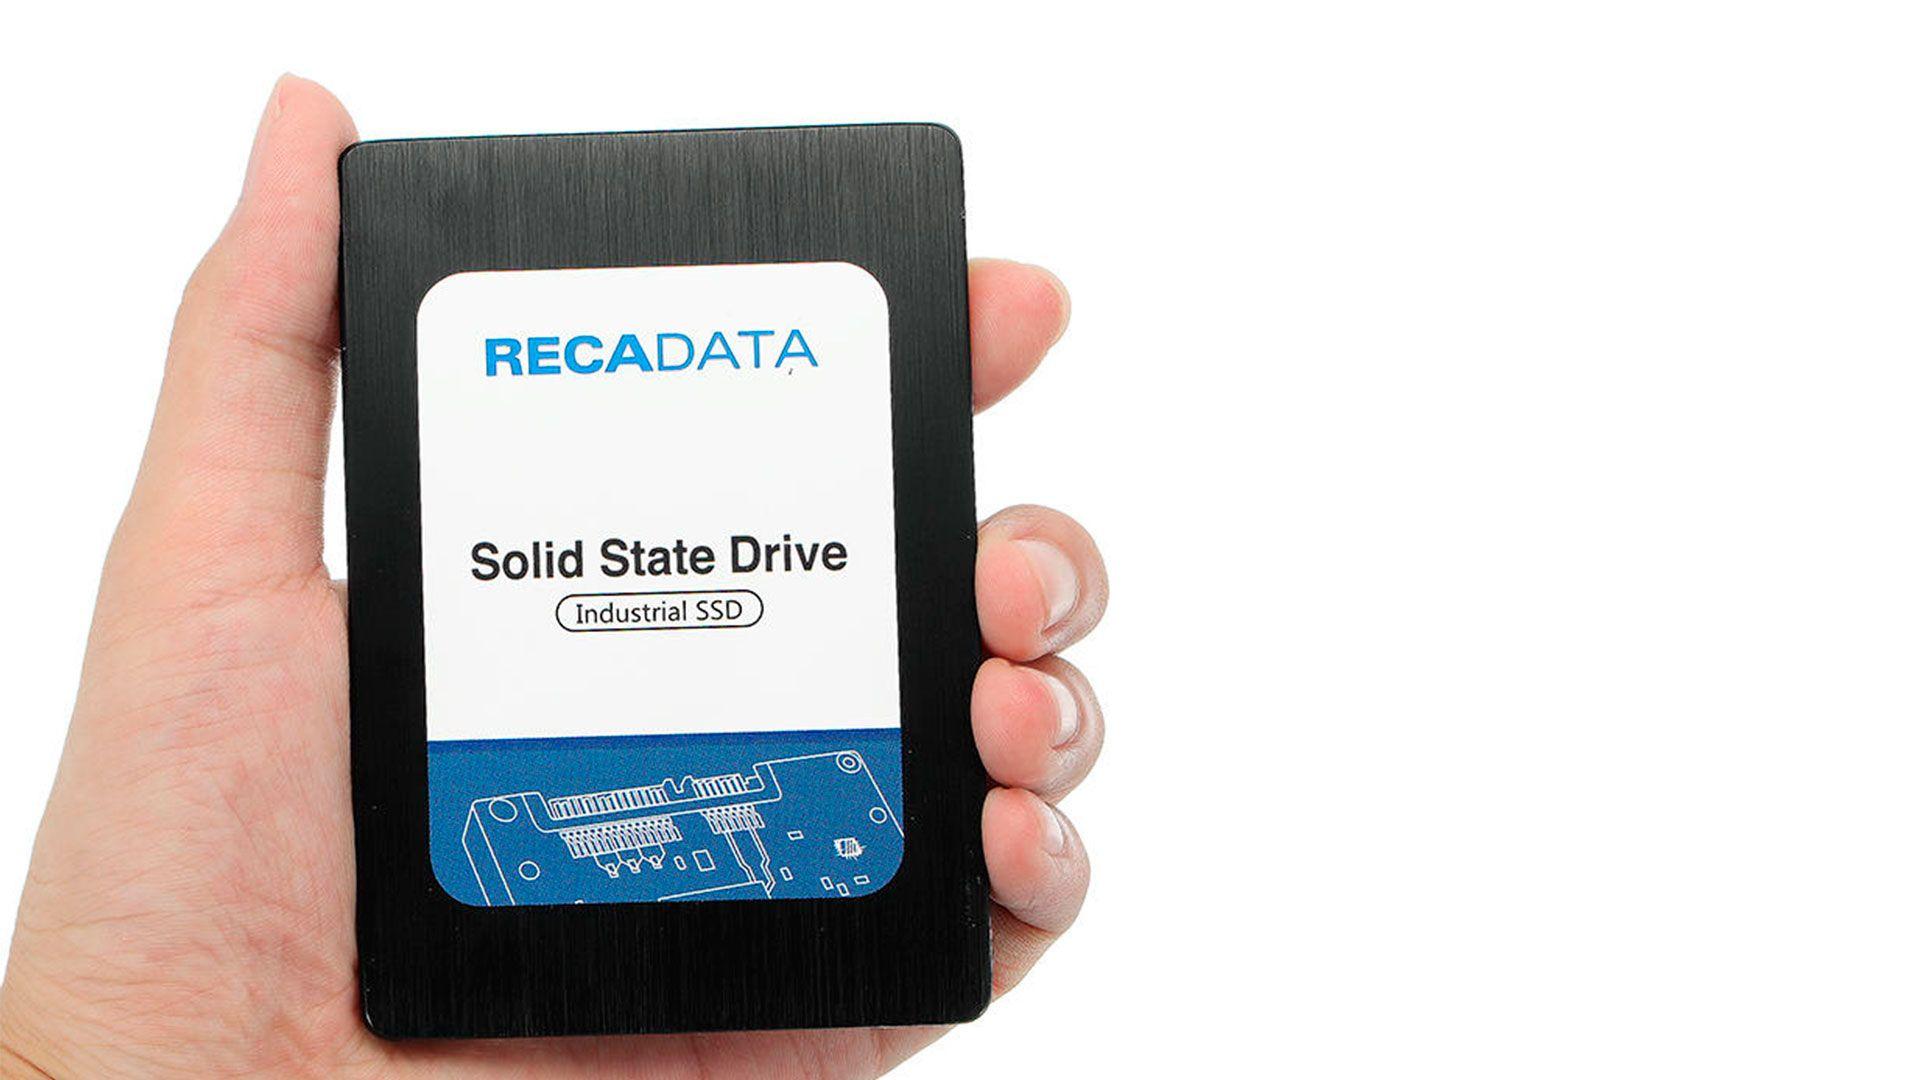 RECADATA SSD